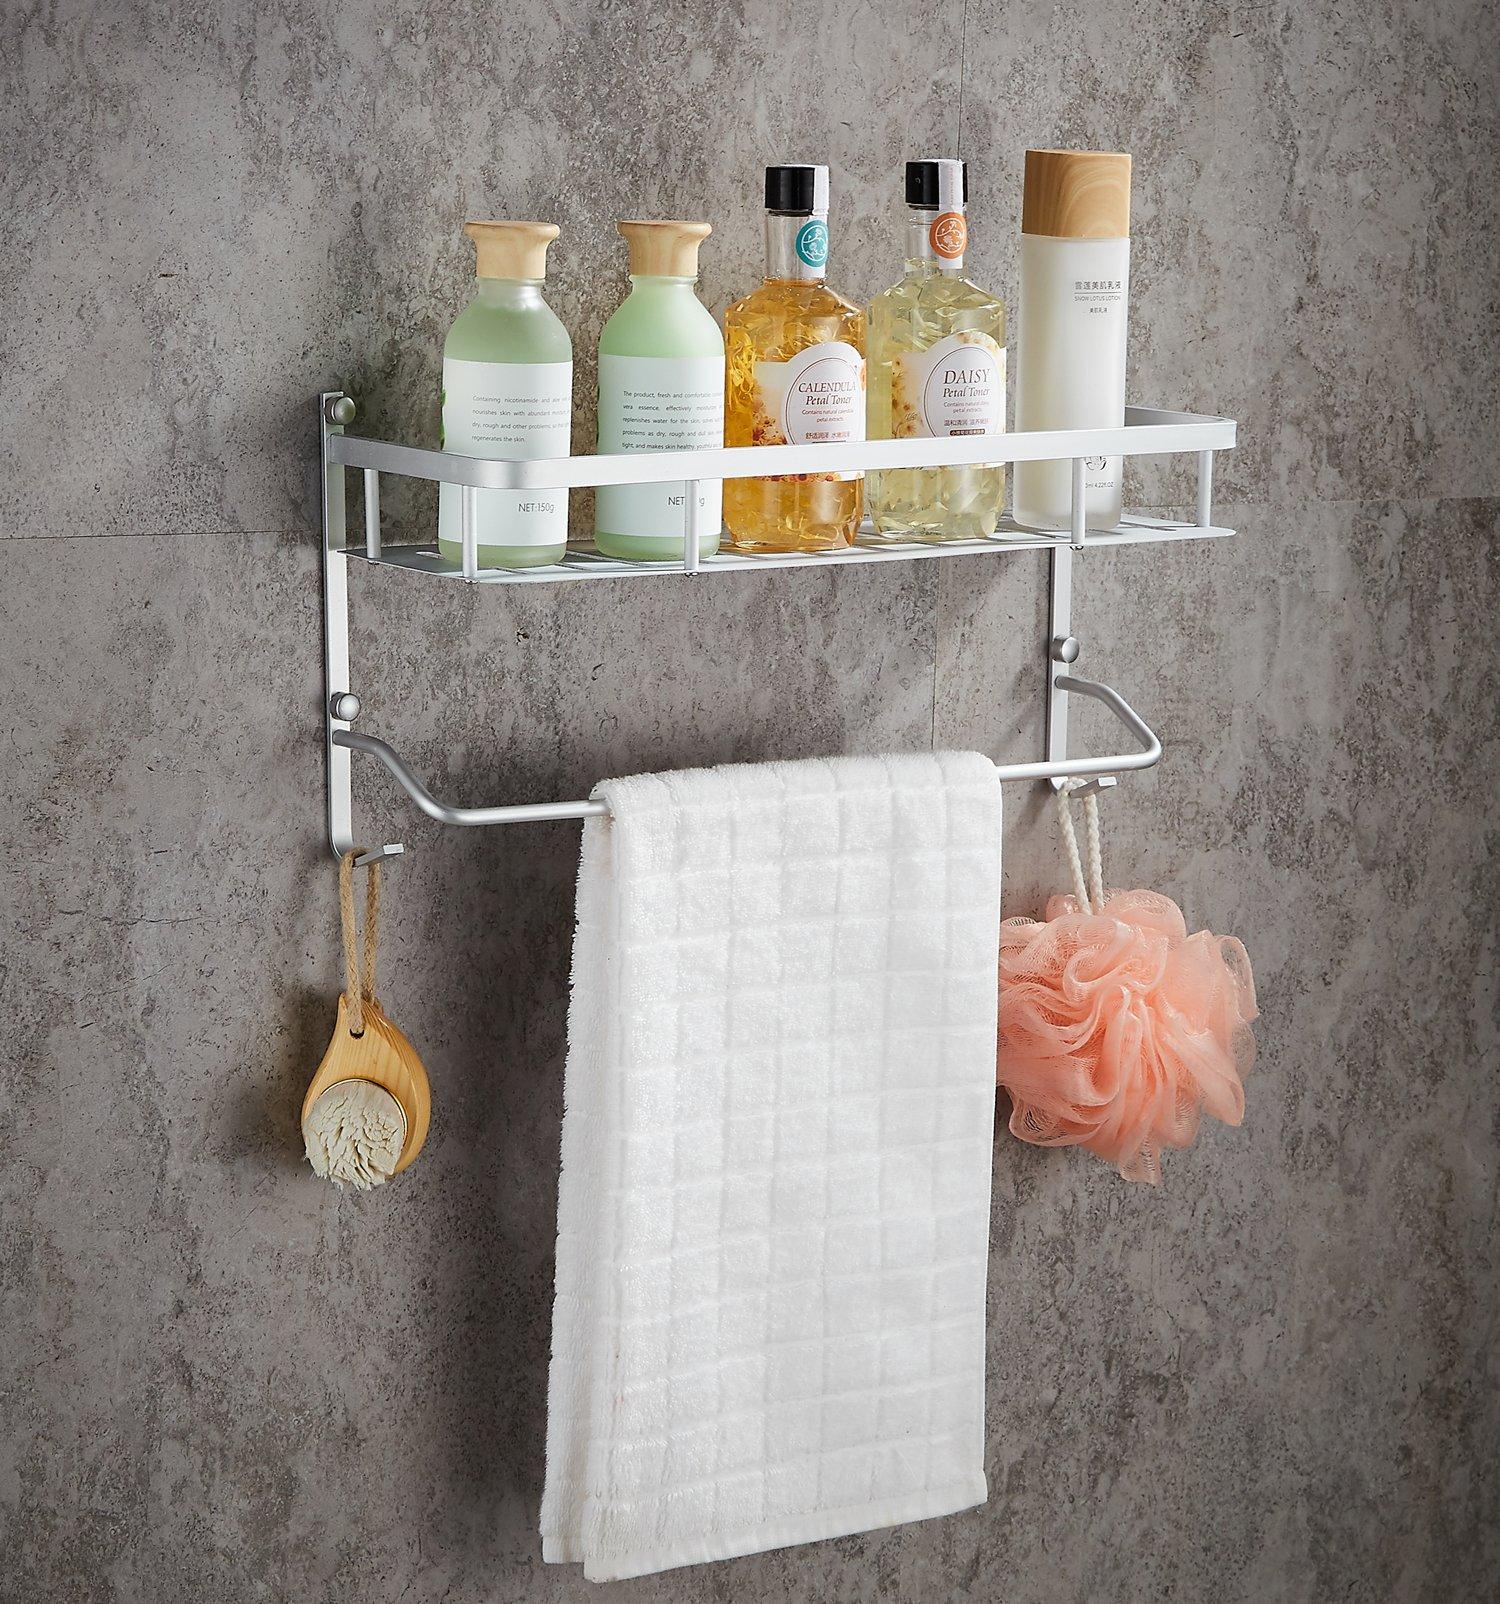 Wall Mounted Aluminum Bathroom Shelves with Towel Bar,Morden Double Deck Towel Rack,Lightweight,24 inch by Dynabit